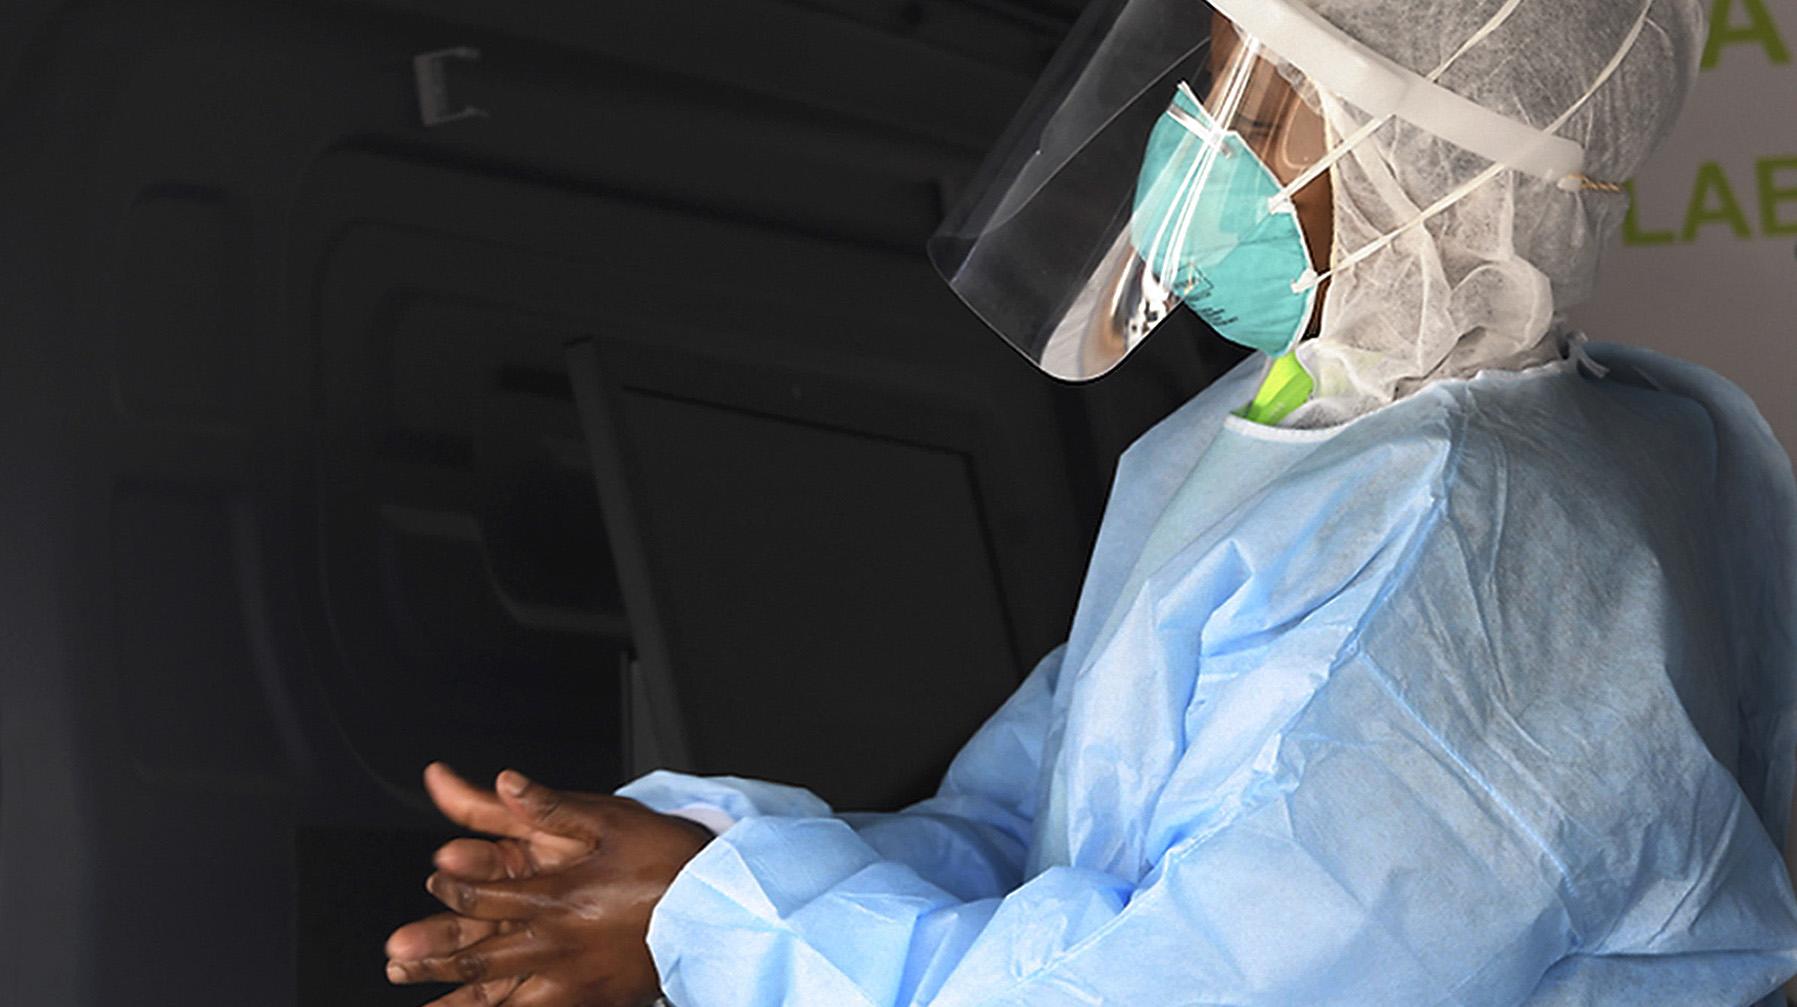 Former Gauteng health finance chief Kabelo Lehloenya fails to drag Premier David Makhura into multimillion-rand PPE probe - Daily Maverick